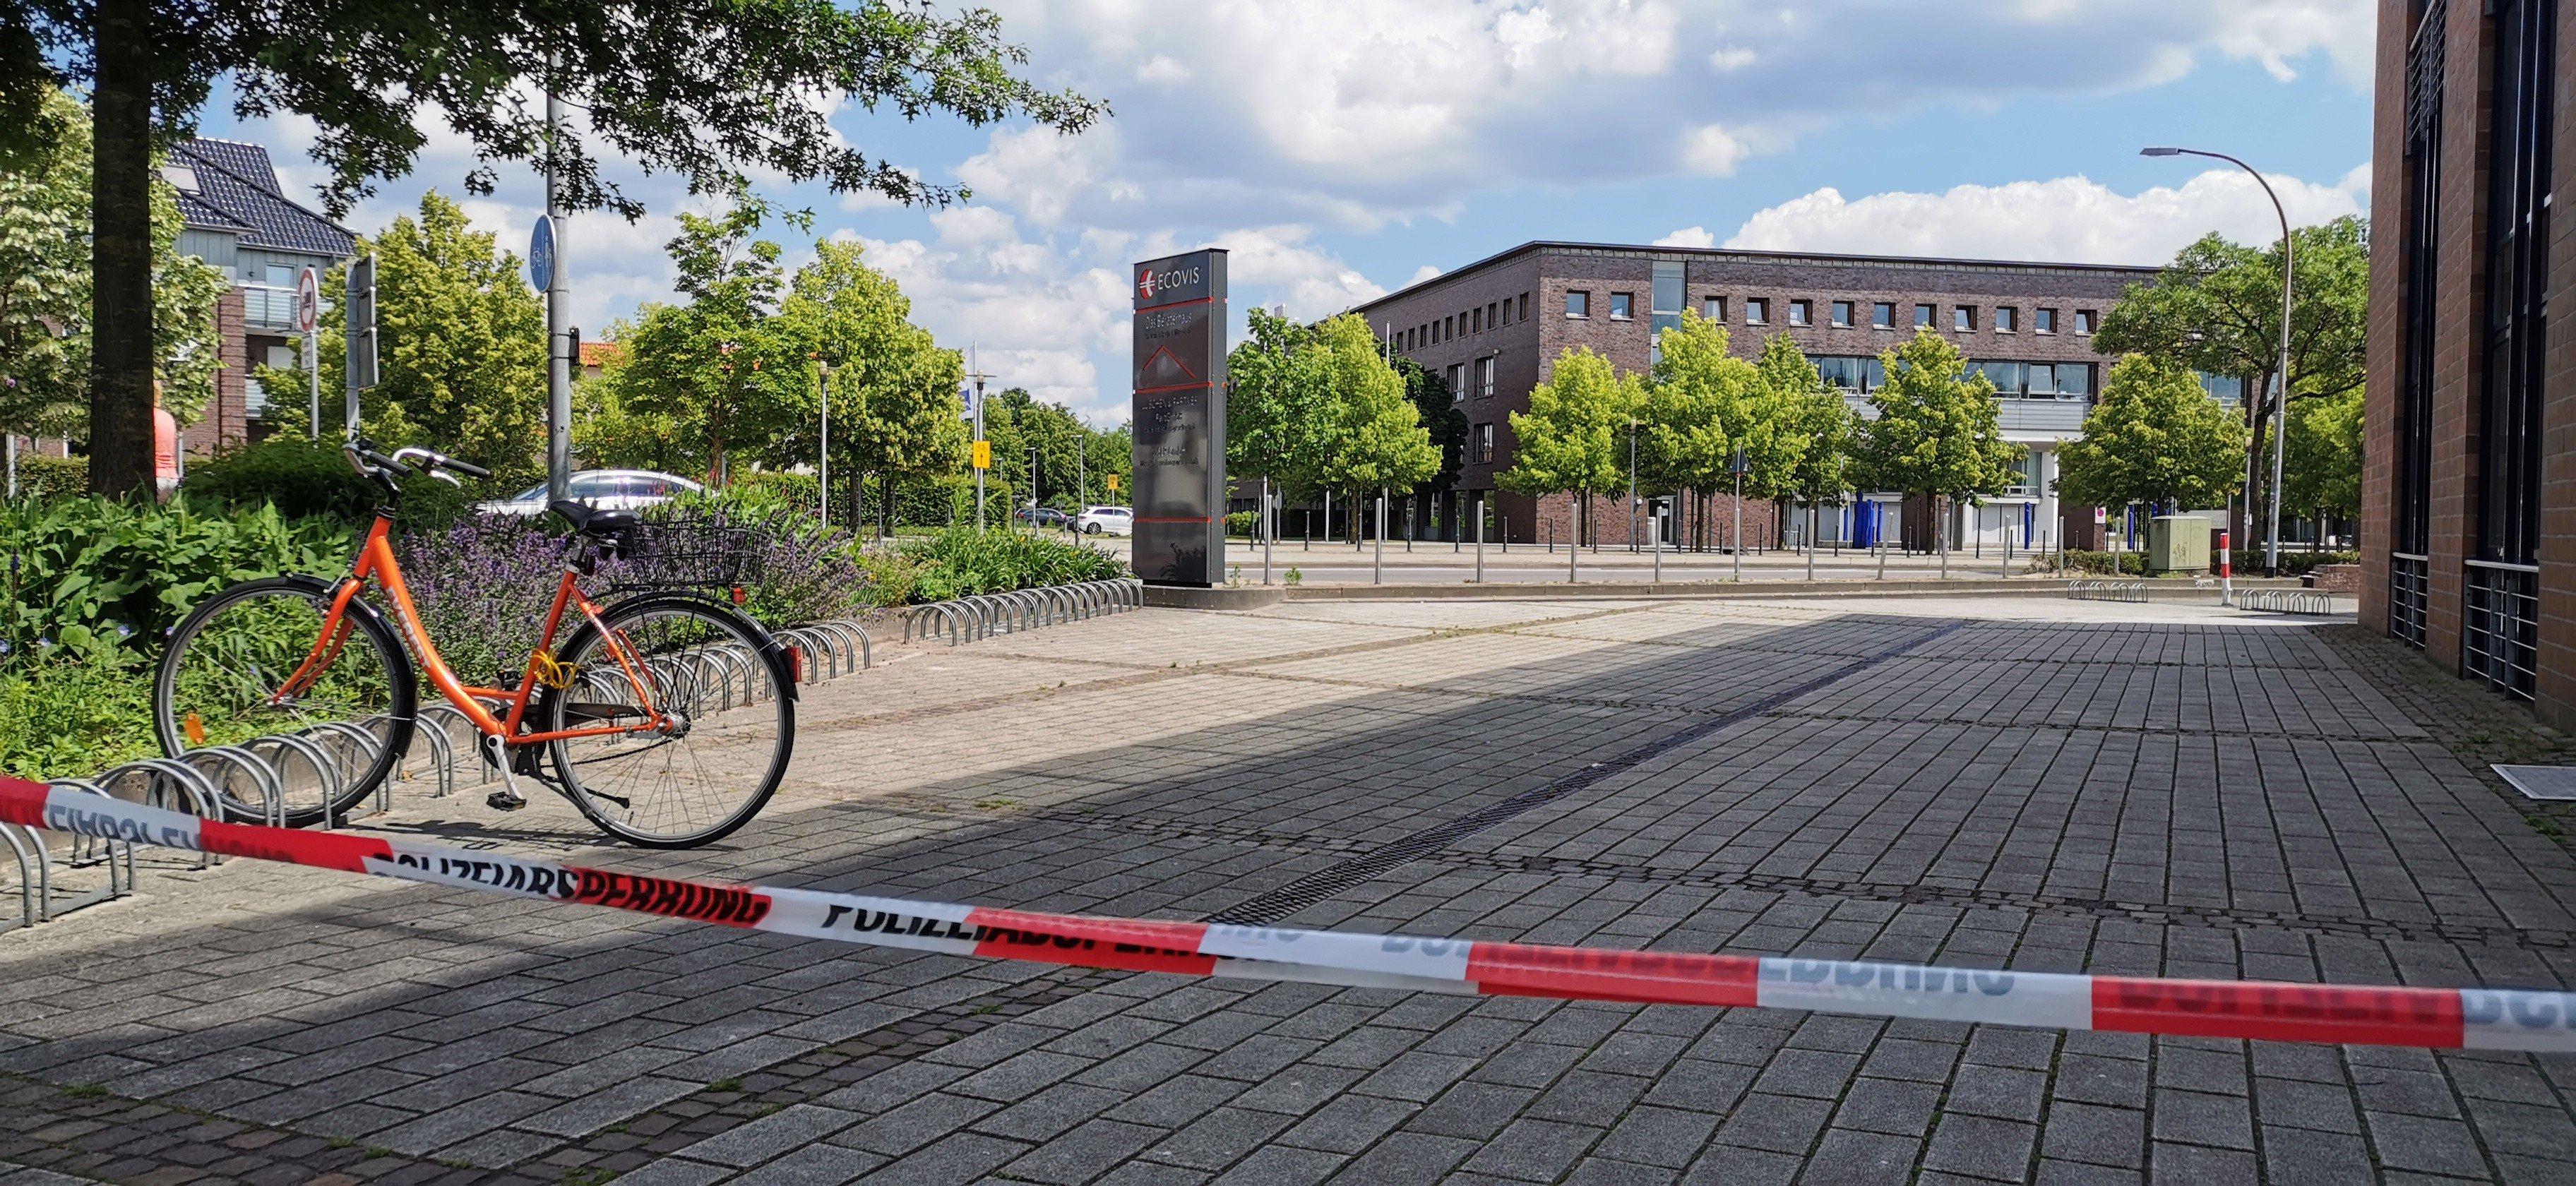 Der Tatort in Vechta. Foto: Nordwestmedia-TV